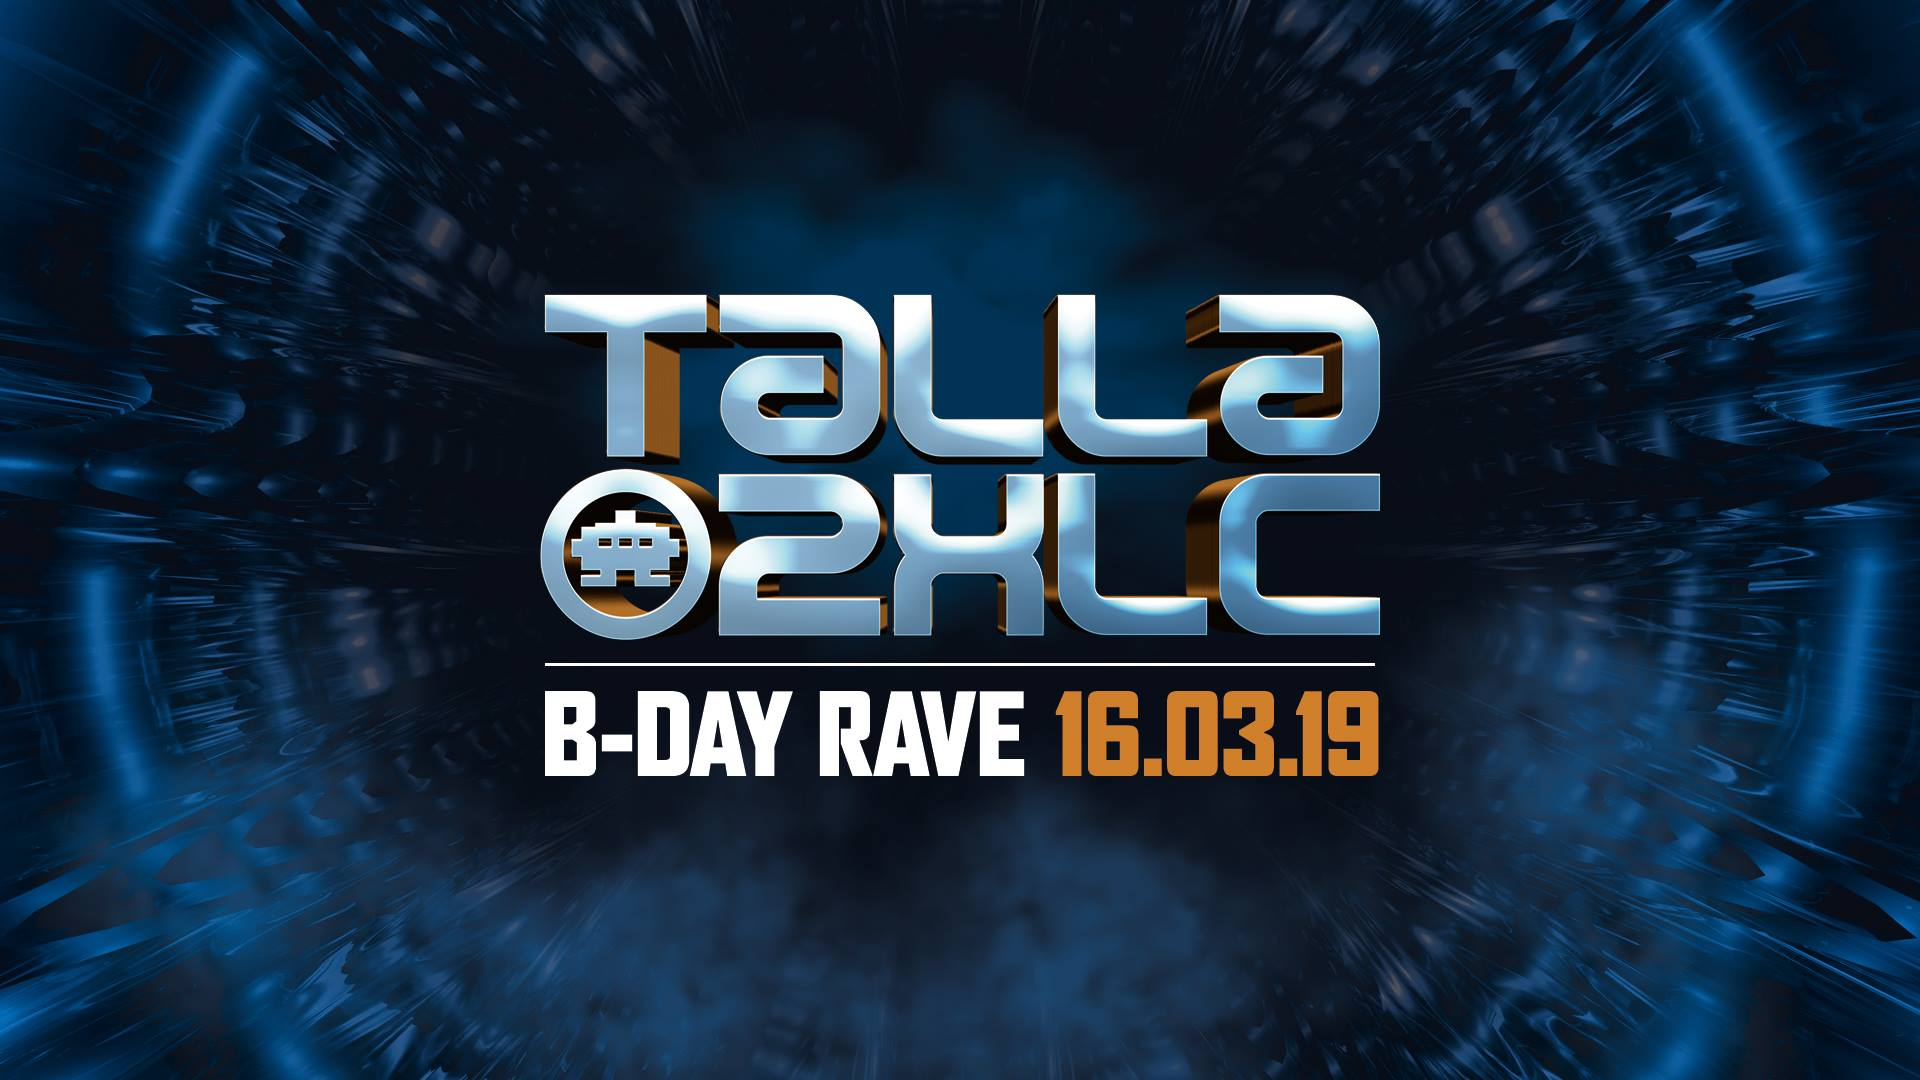 16.03.2019 Talla 2XLC Birthday Rave, Offenbach